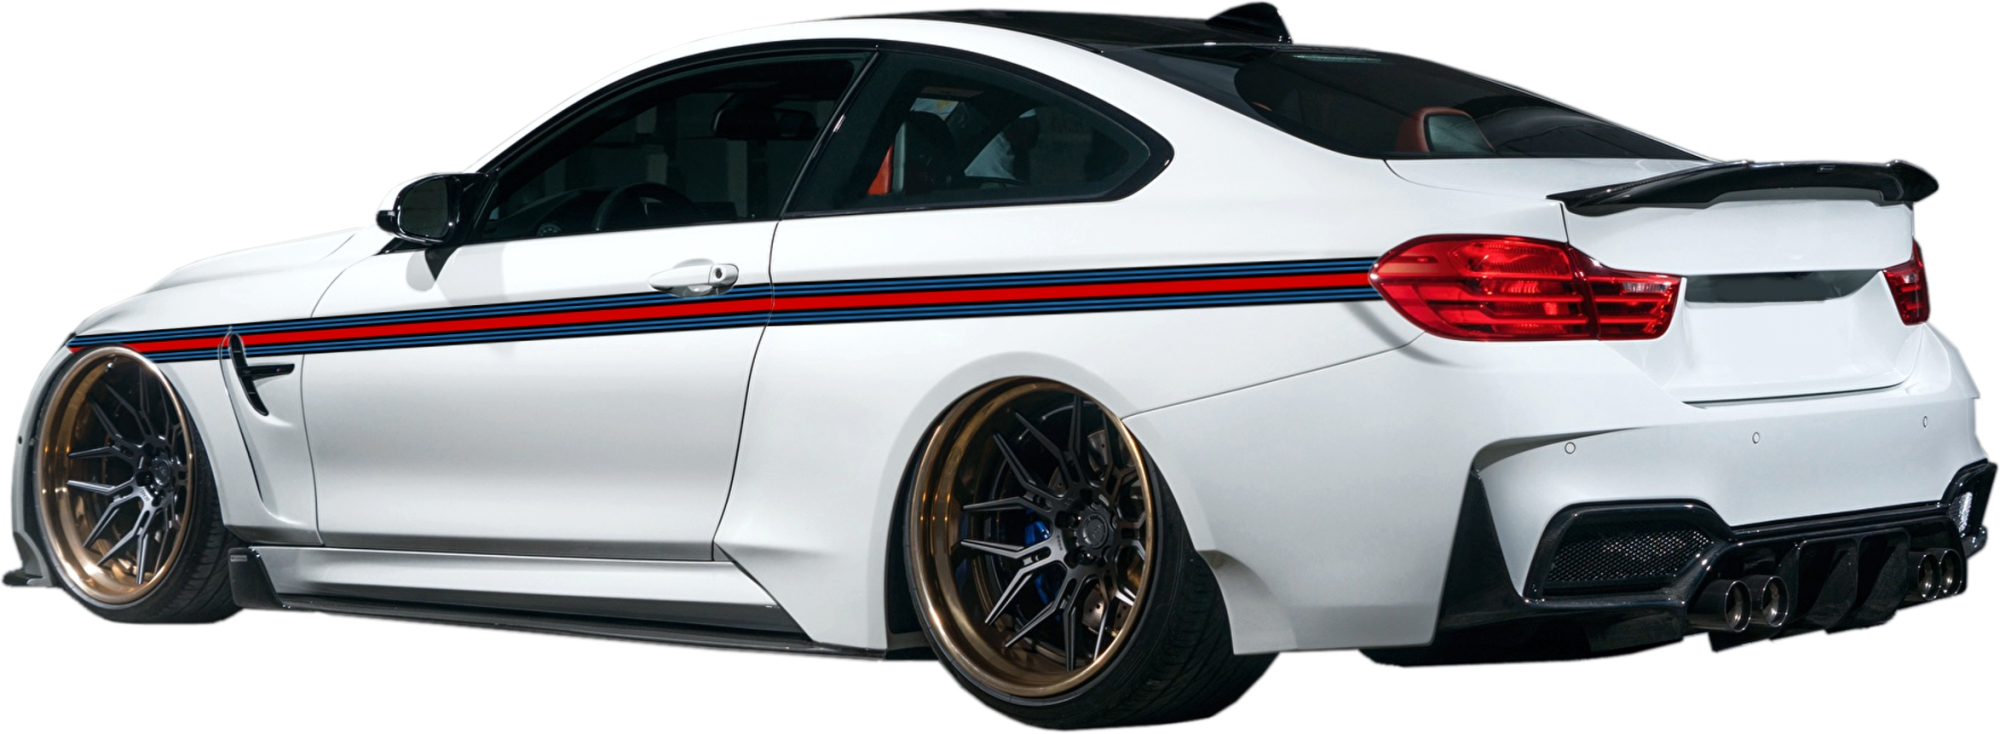 "Sripe Racing "" rouge/noir/bleu  5 m x 60 mm – Bild 1"